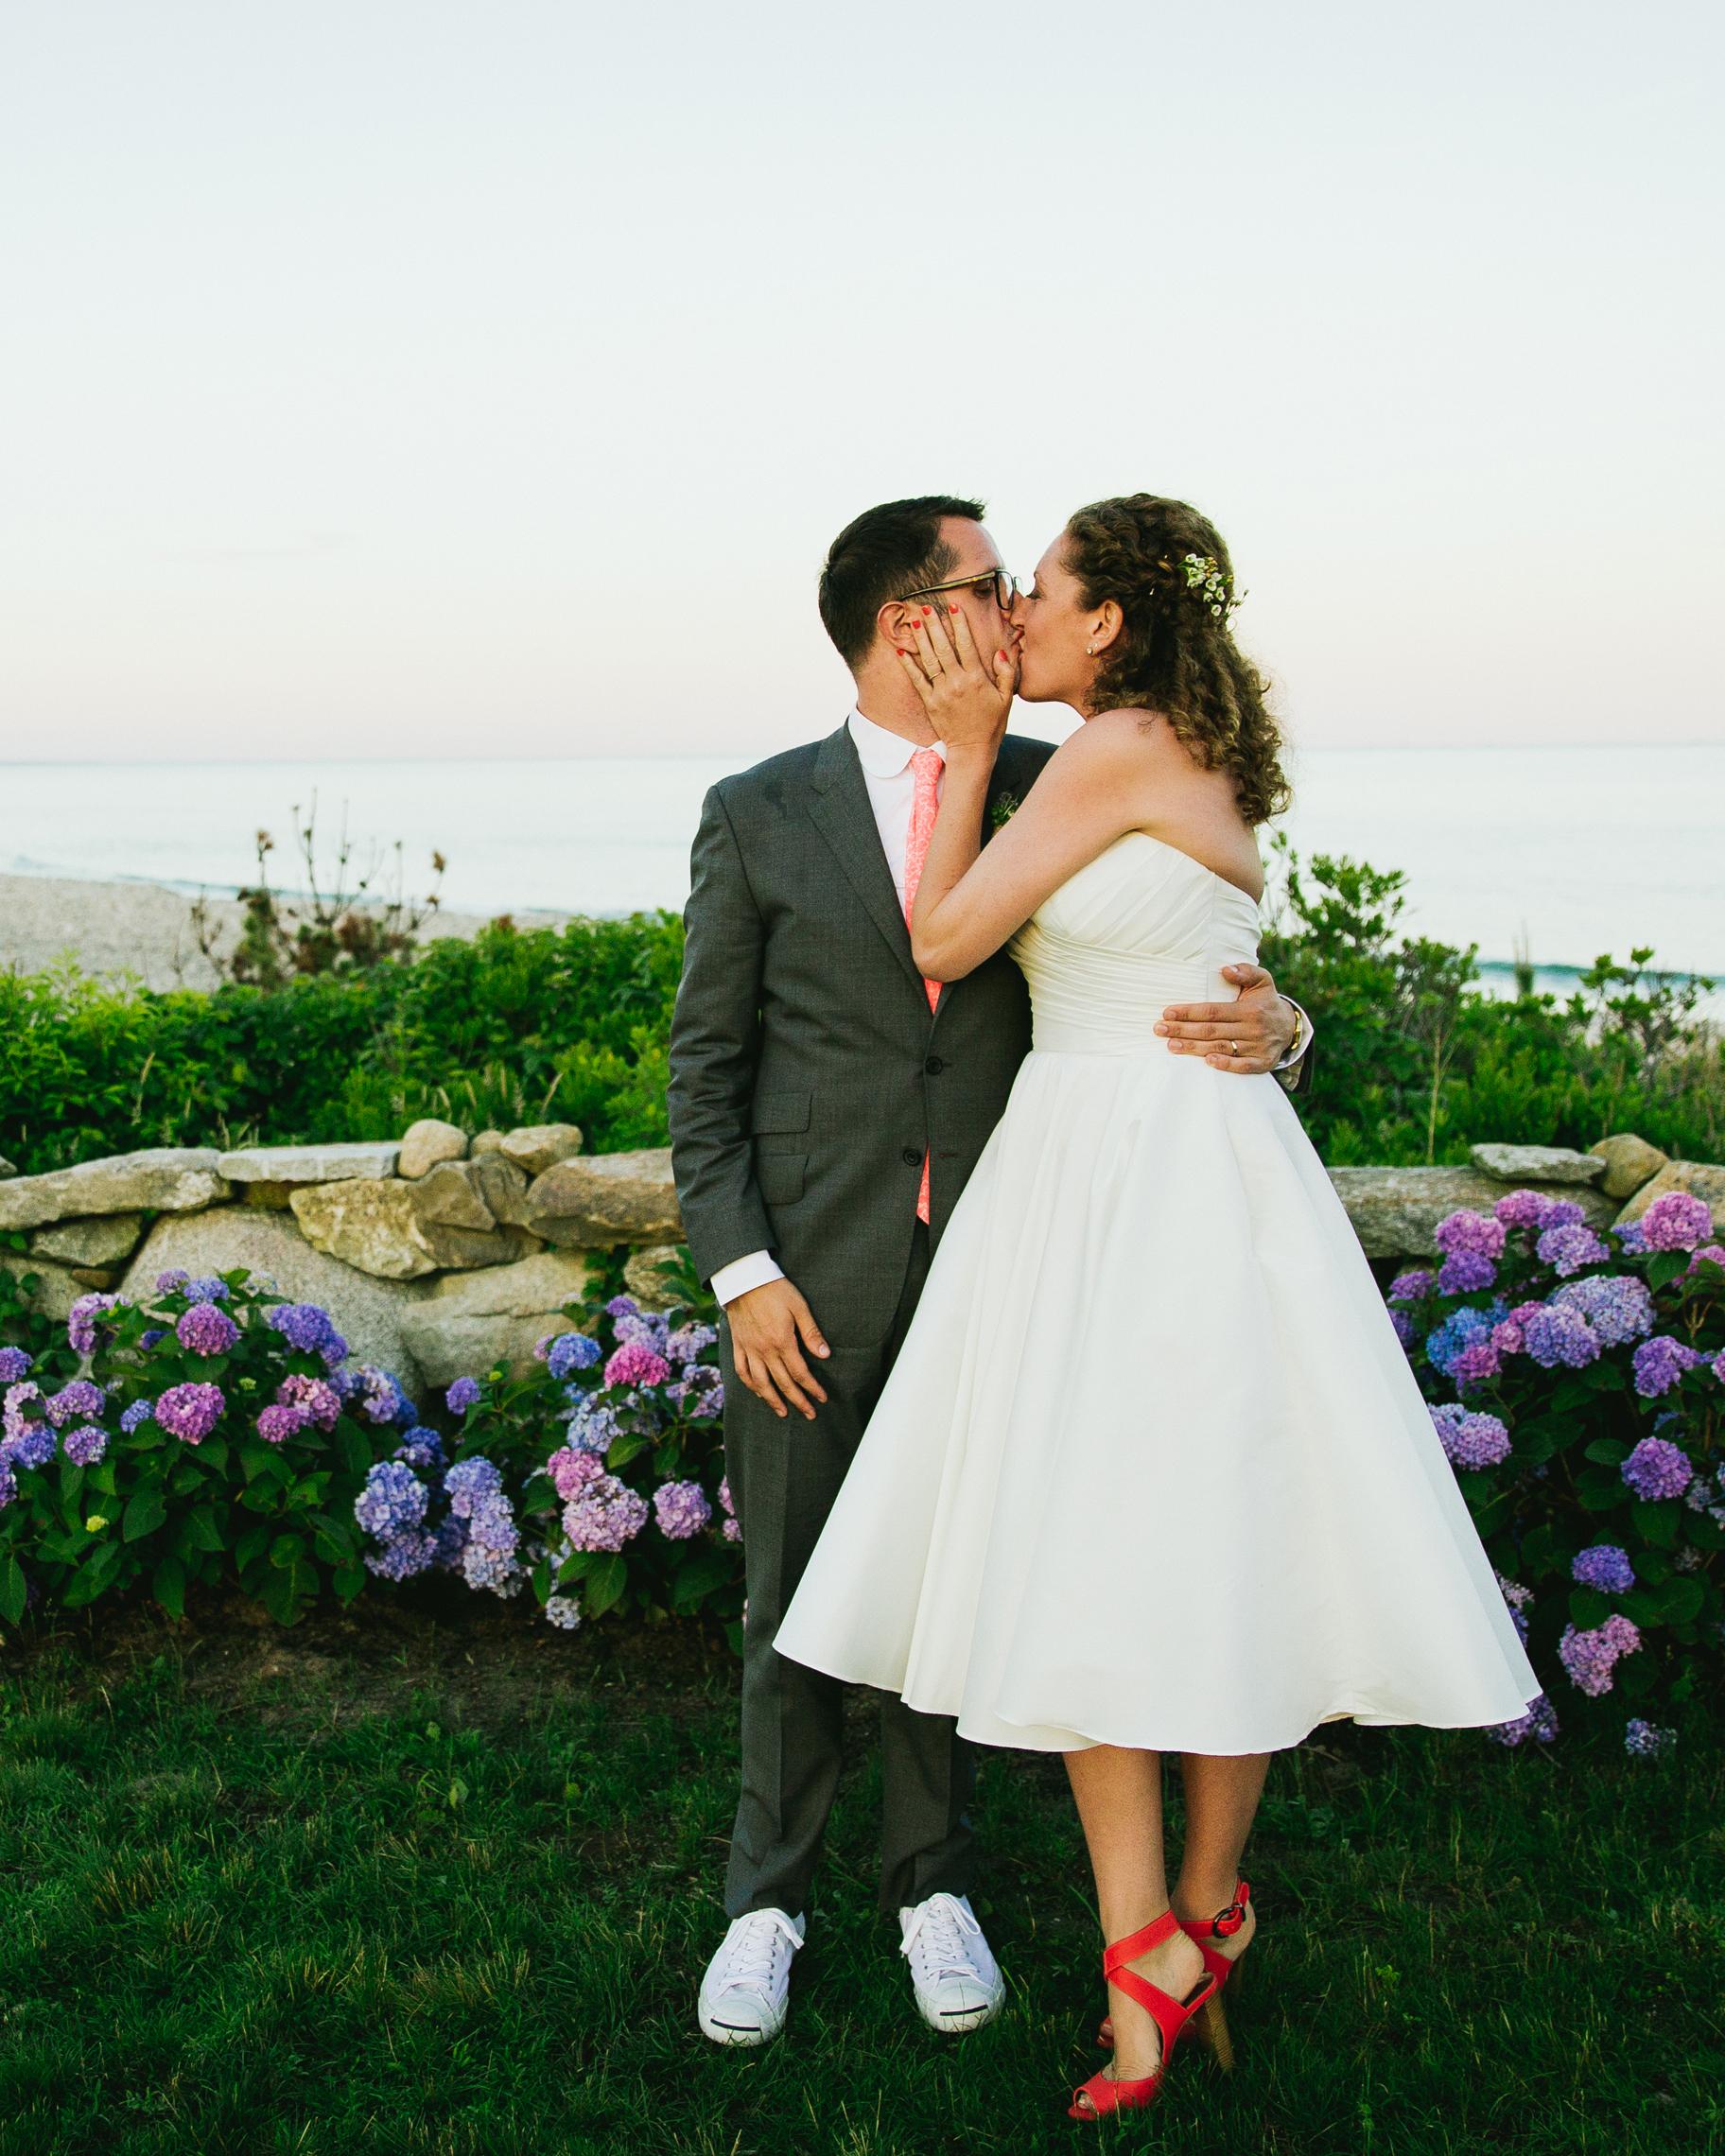 gabriela-tyson-wedding-couple-1013-s111708-1214.jpg